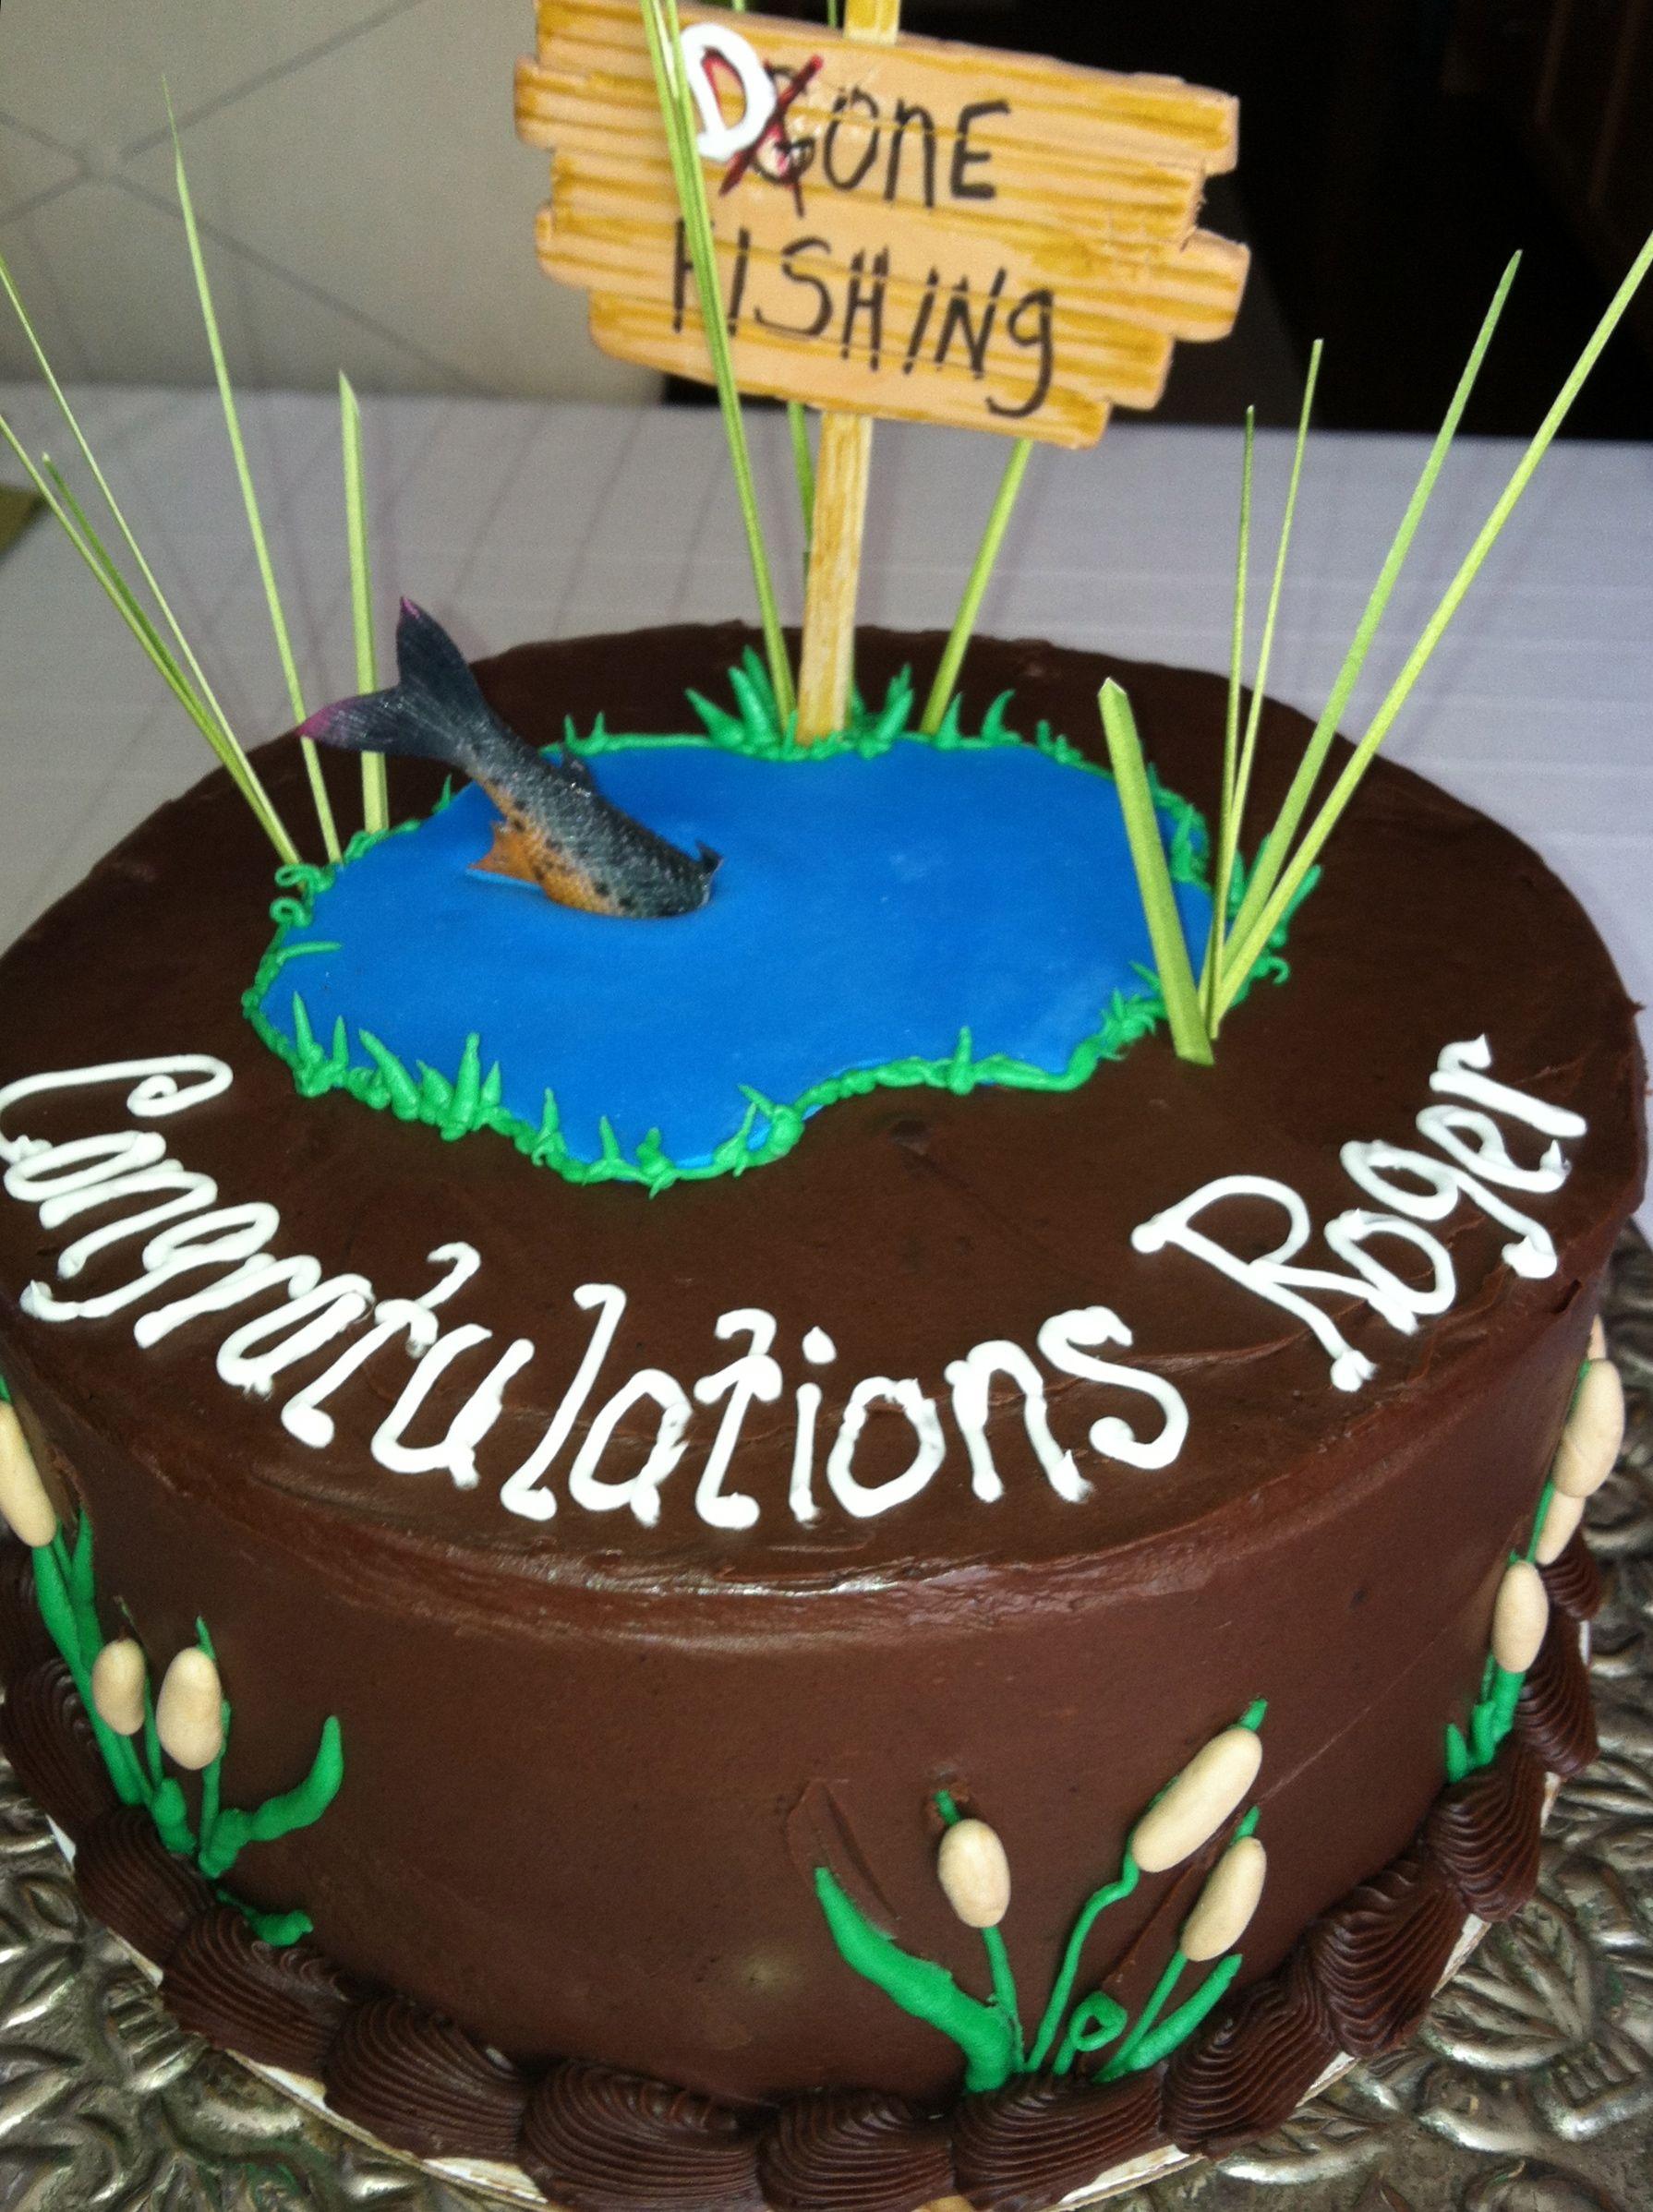 Retirement Cake Gone Fishing